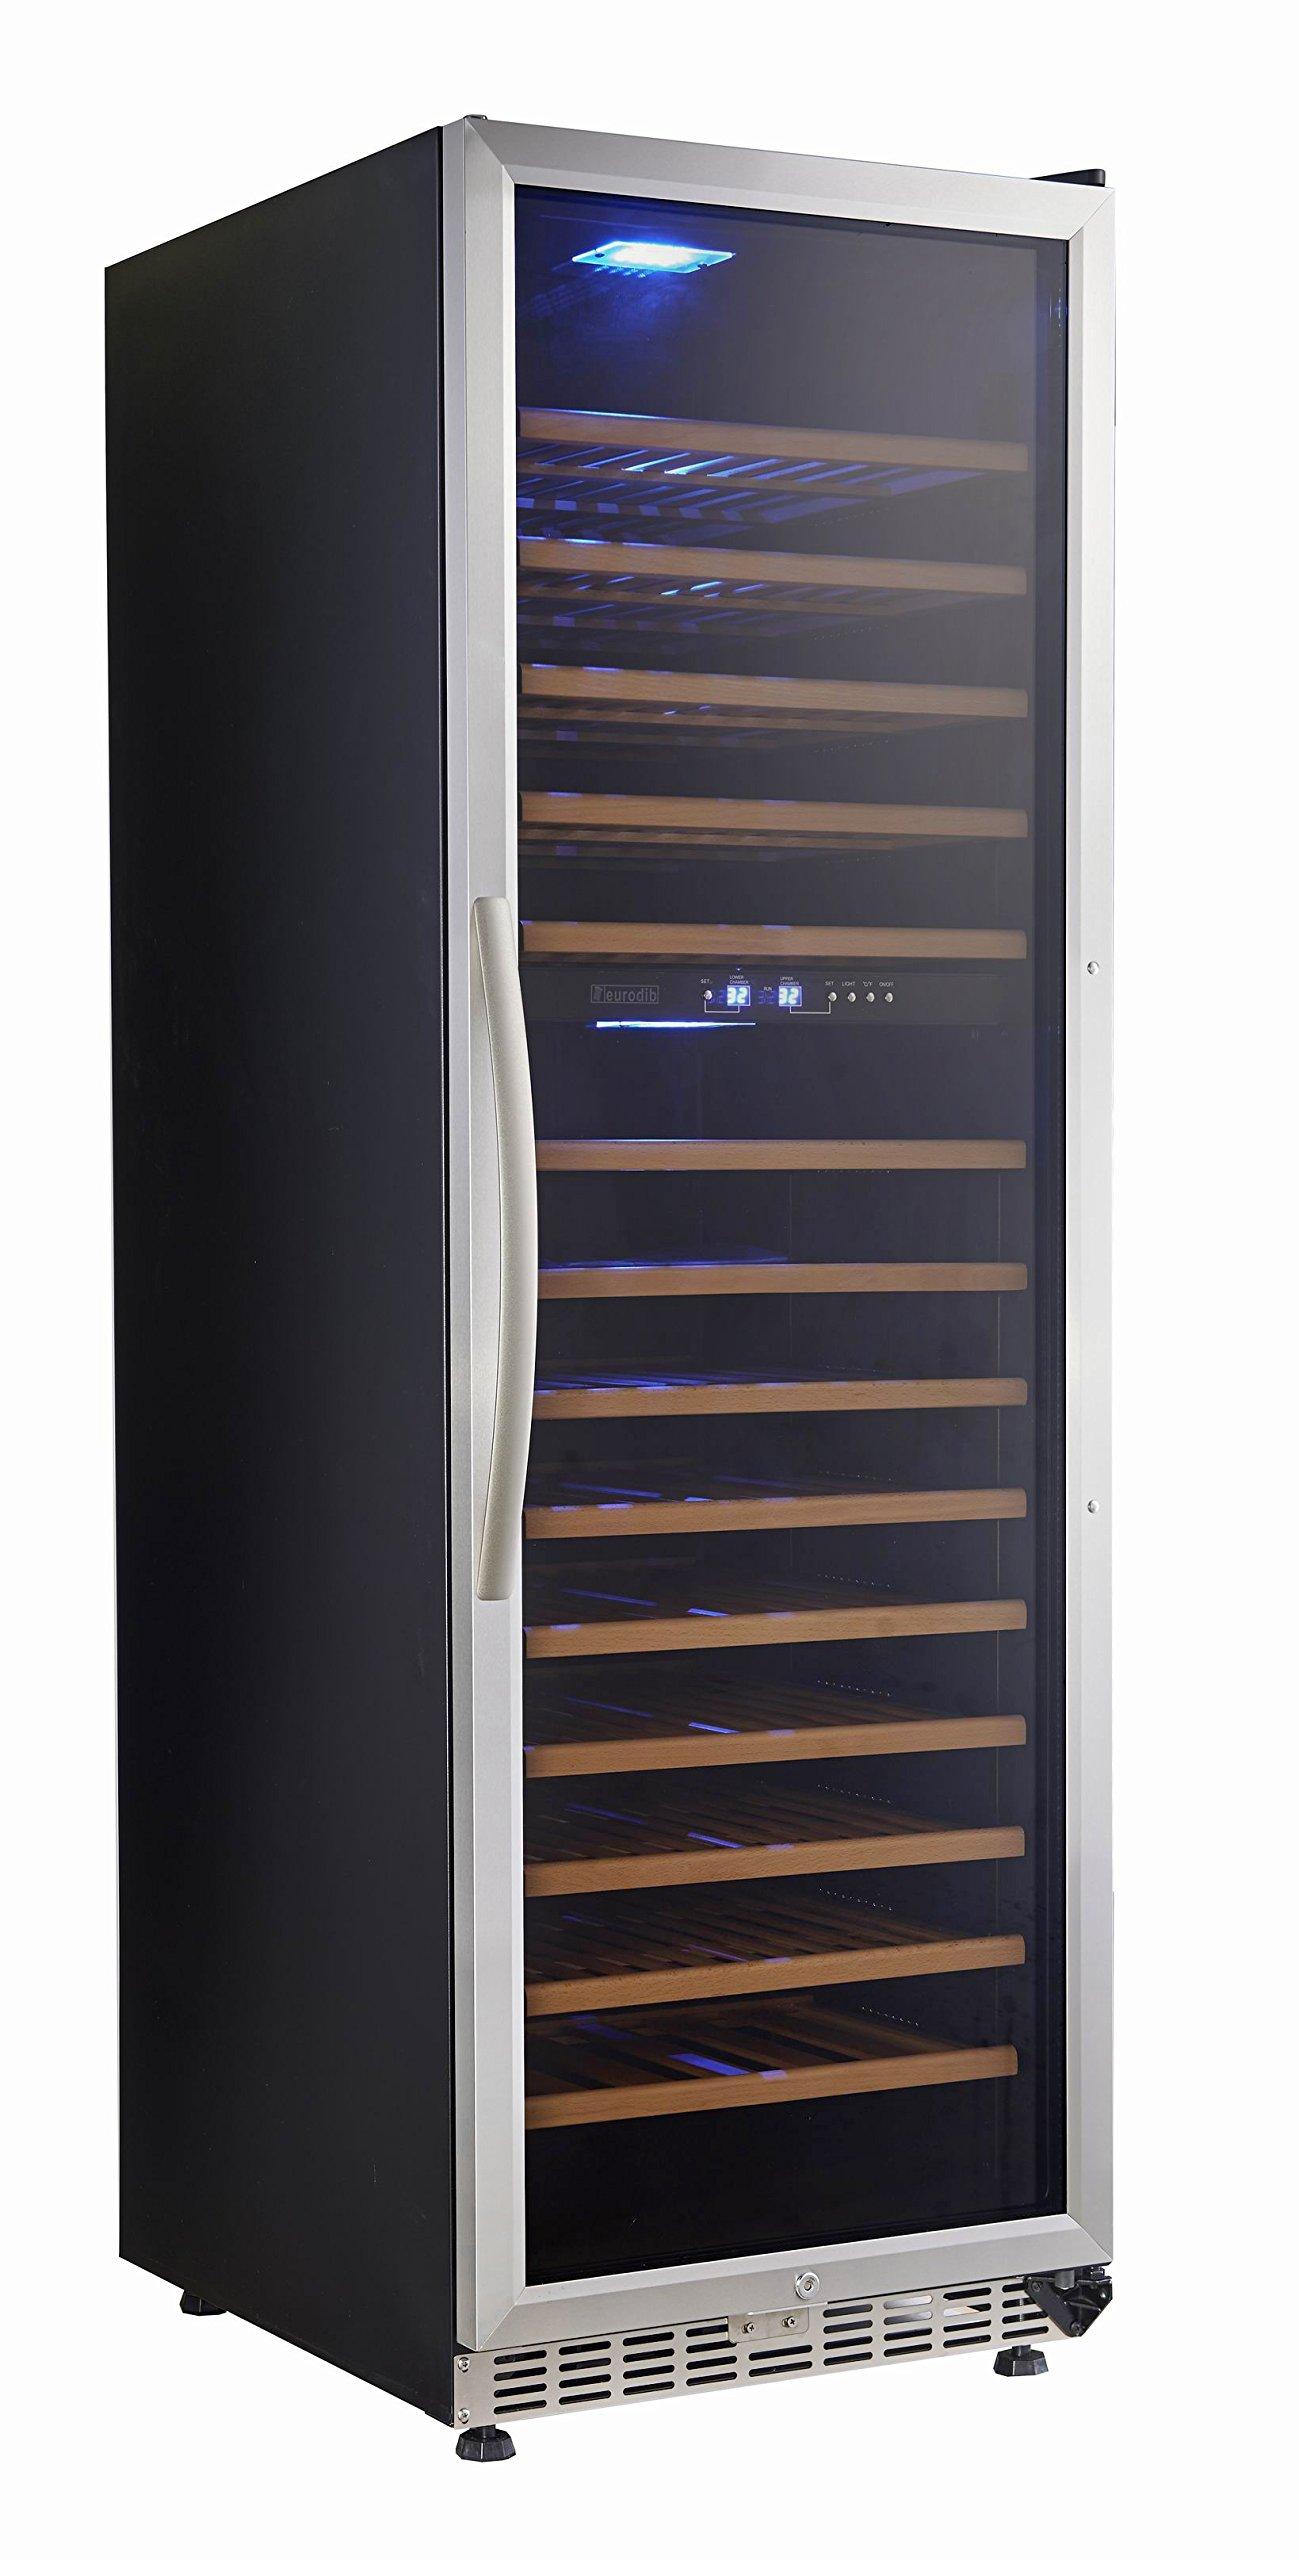 Eurodib USF168D 154 Bottles Dual Temperature Wine Cellar by Eurodib